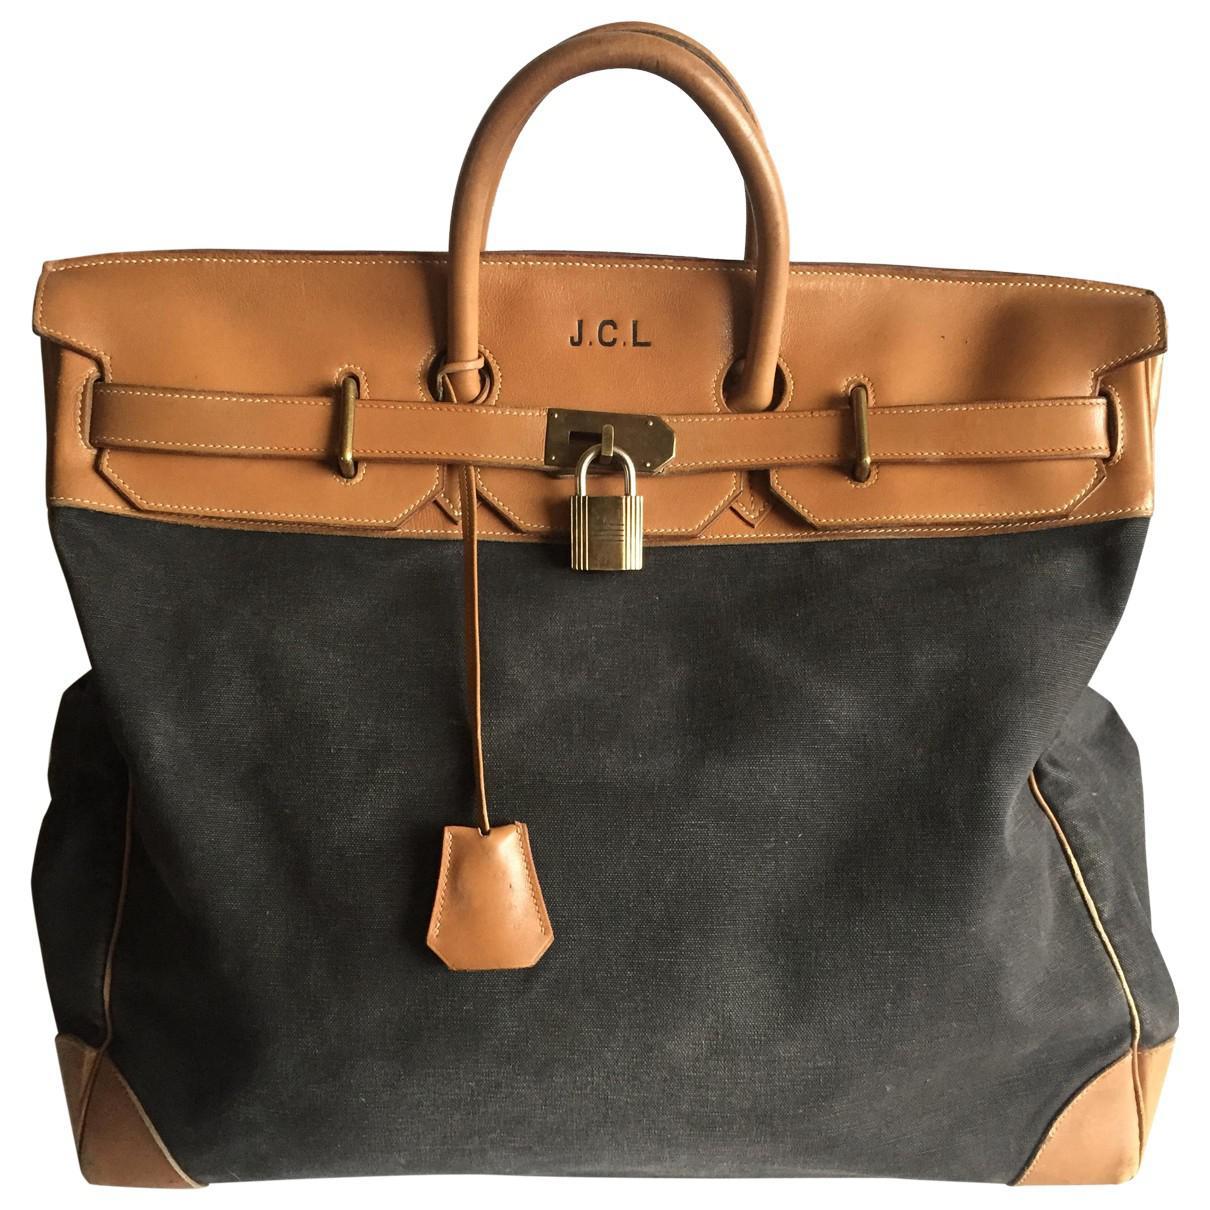 c5fbcae7d58 Lyst - Hermès Haut À Courroies Cloth 48h Bag in Gray